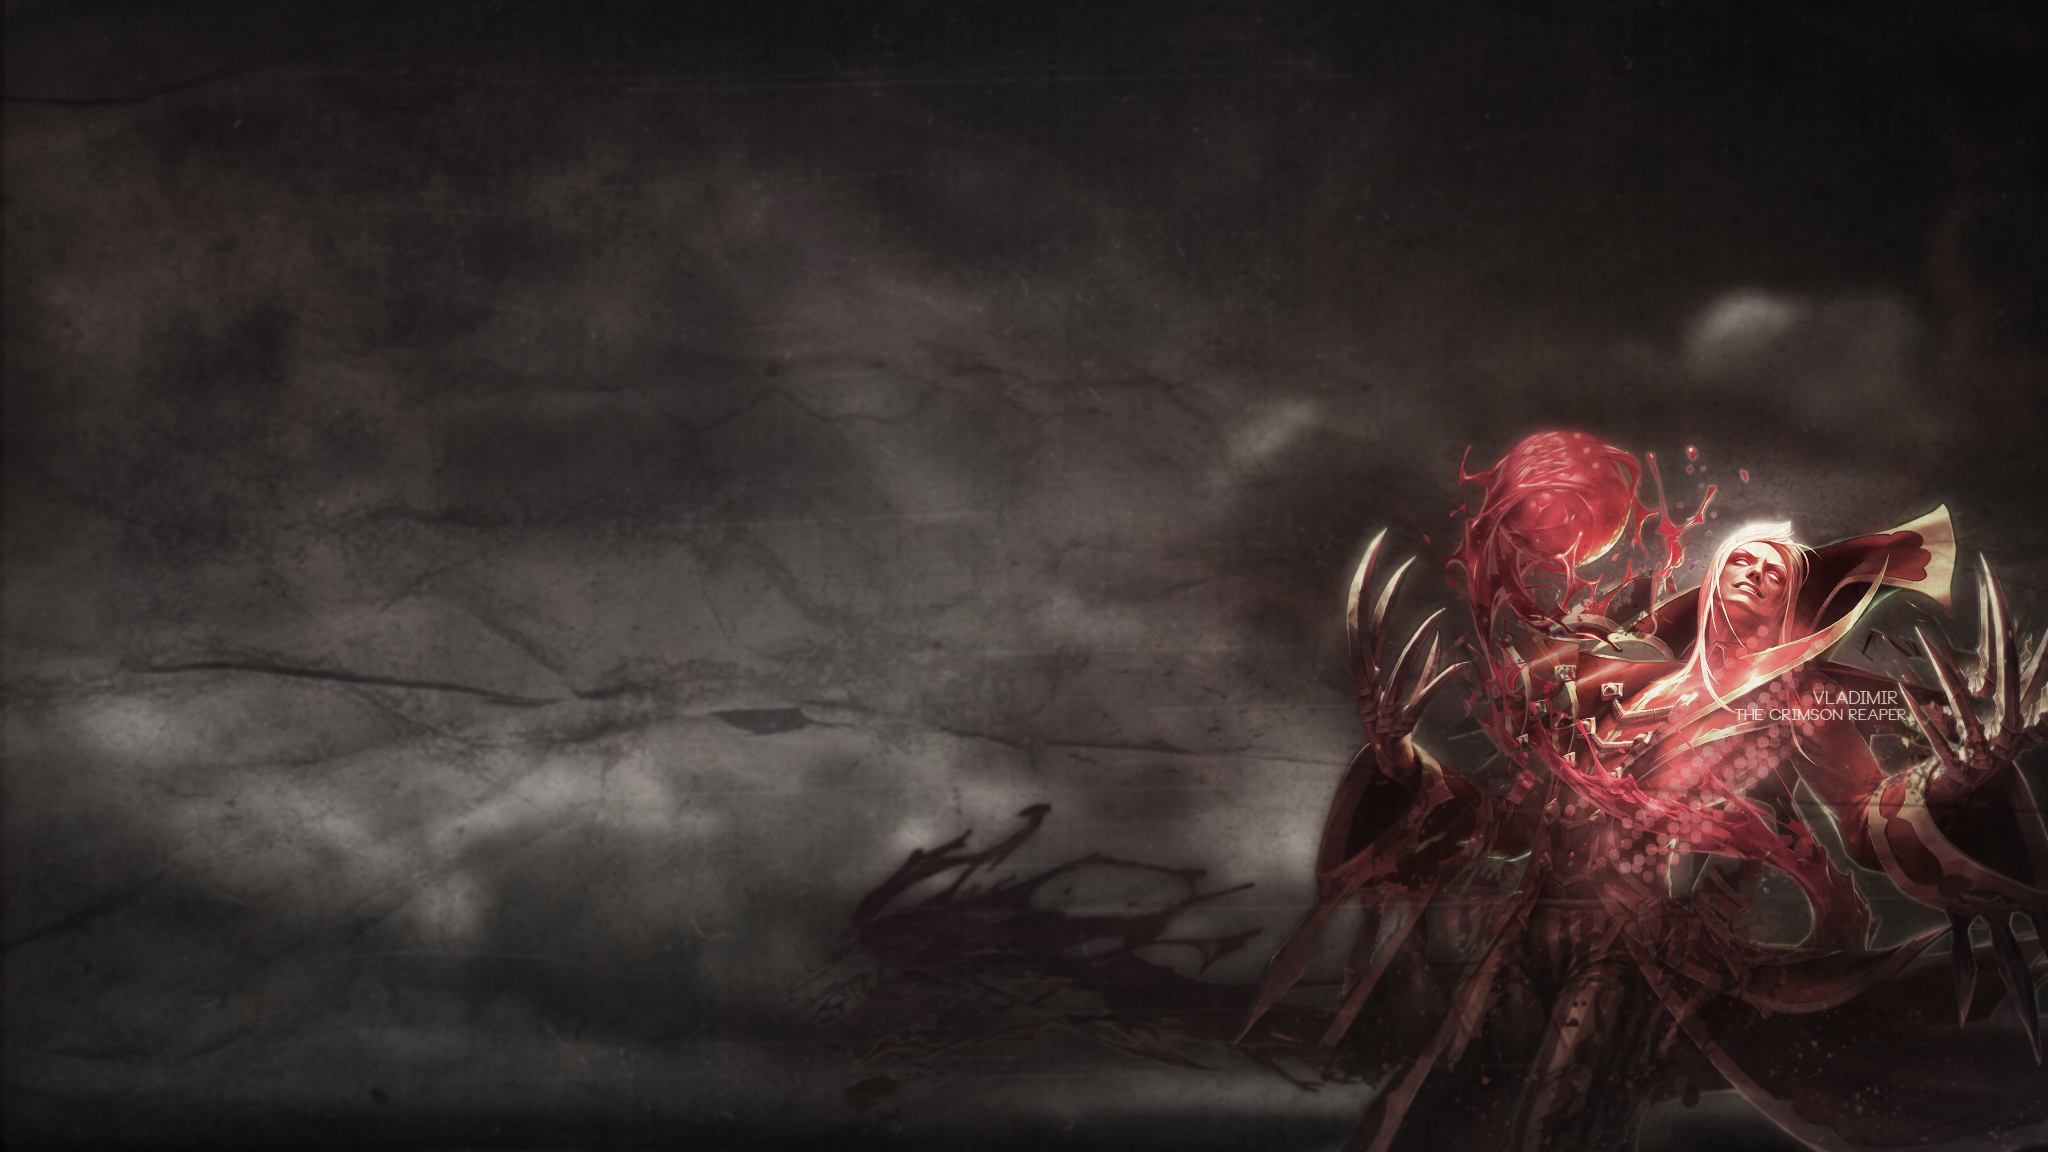 Vladimir the Crimson Reaper by ChenWei91